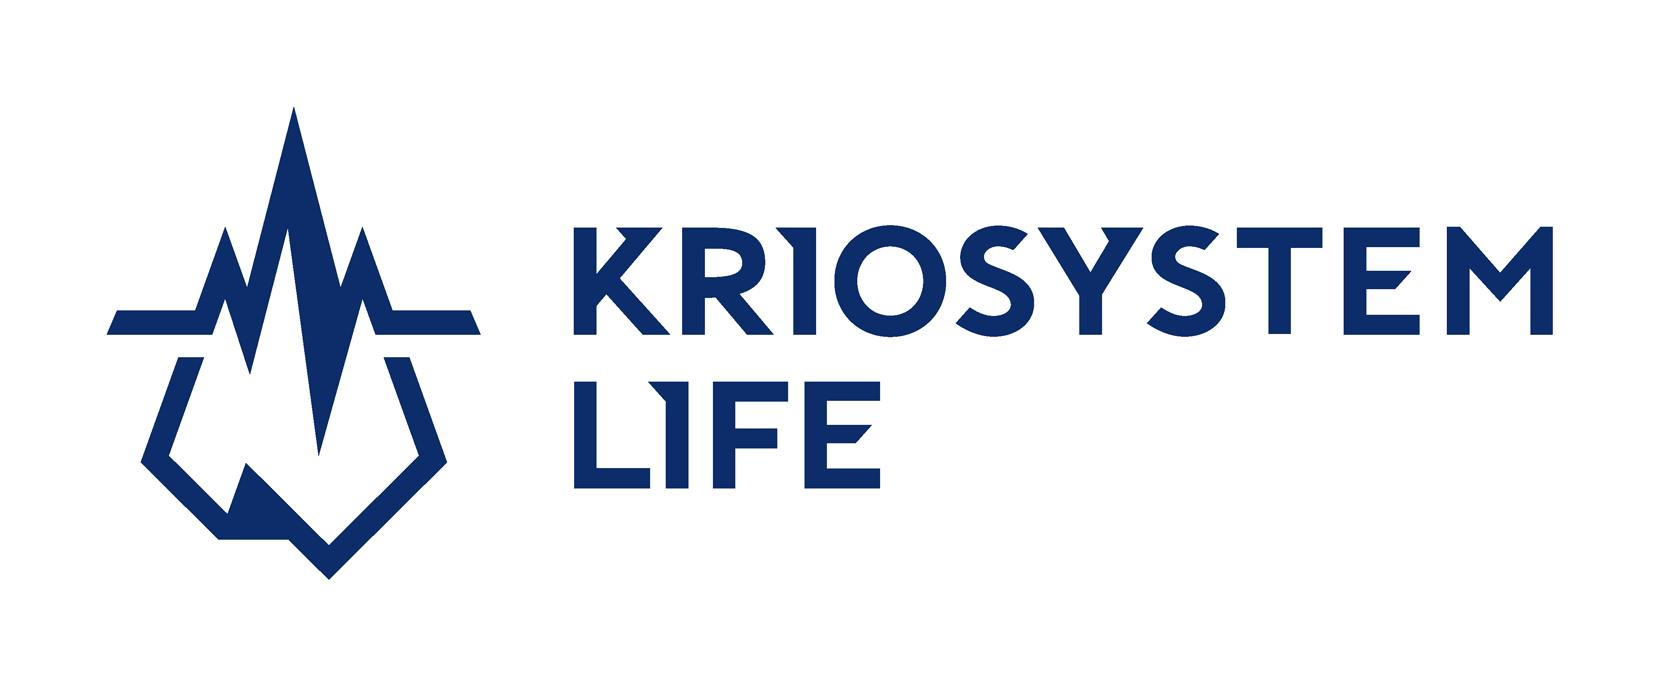 KRIOSYSTEMlife_LOGO_s